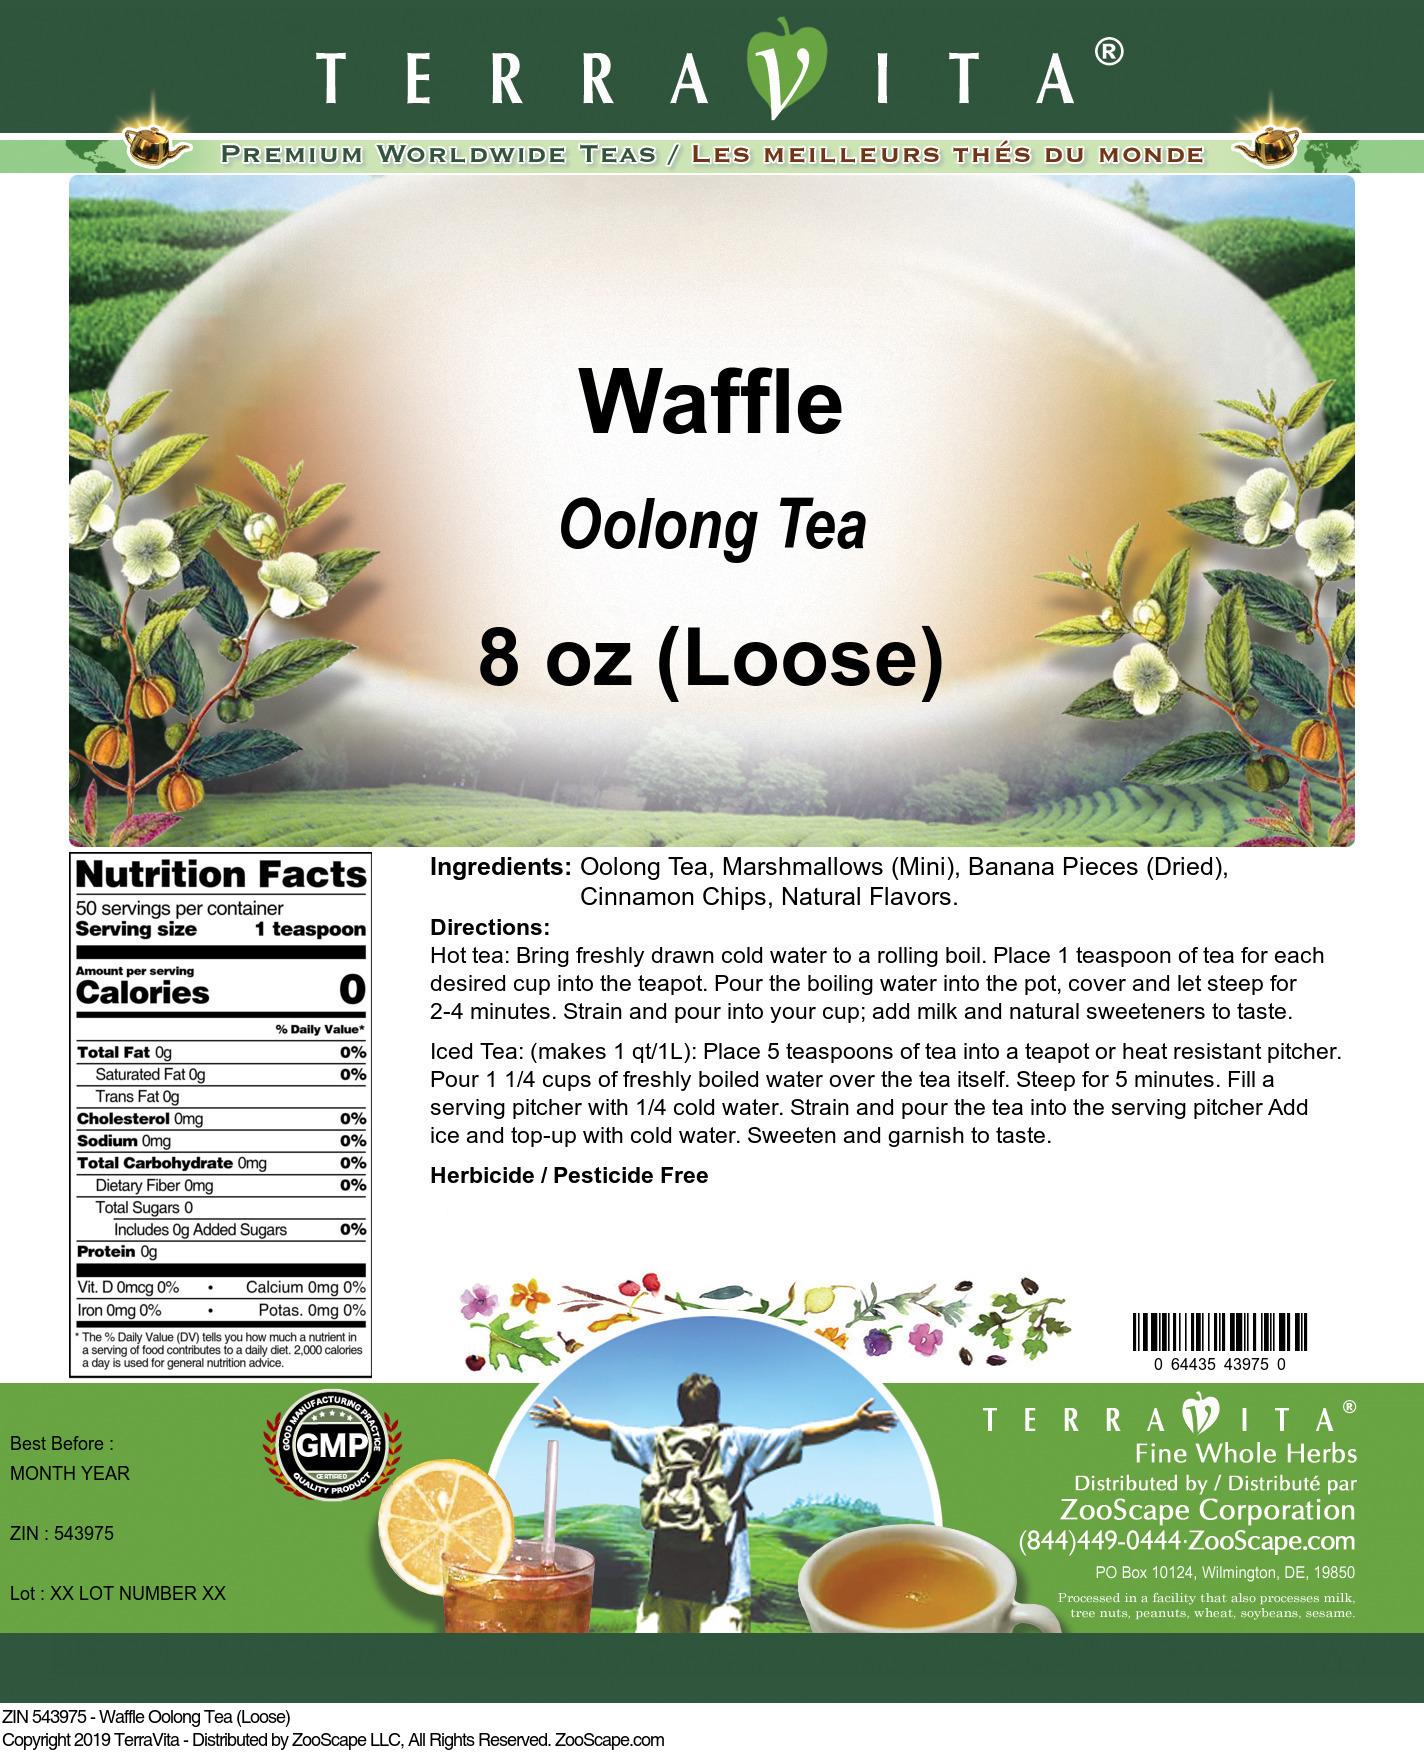 Waffle Oolong Tea